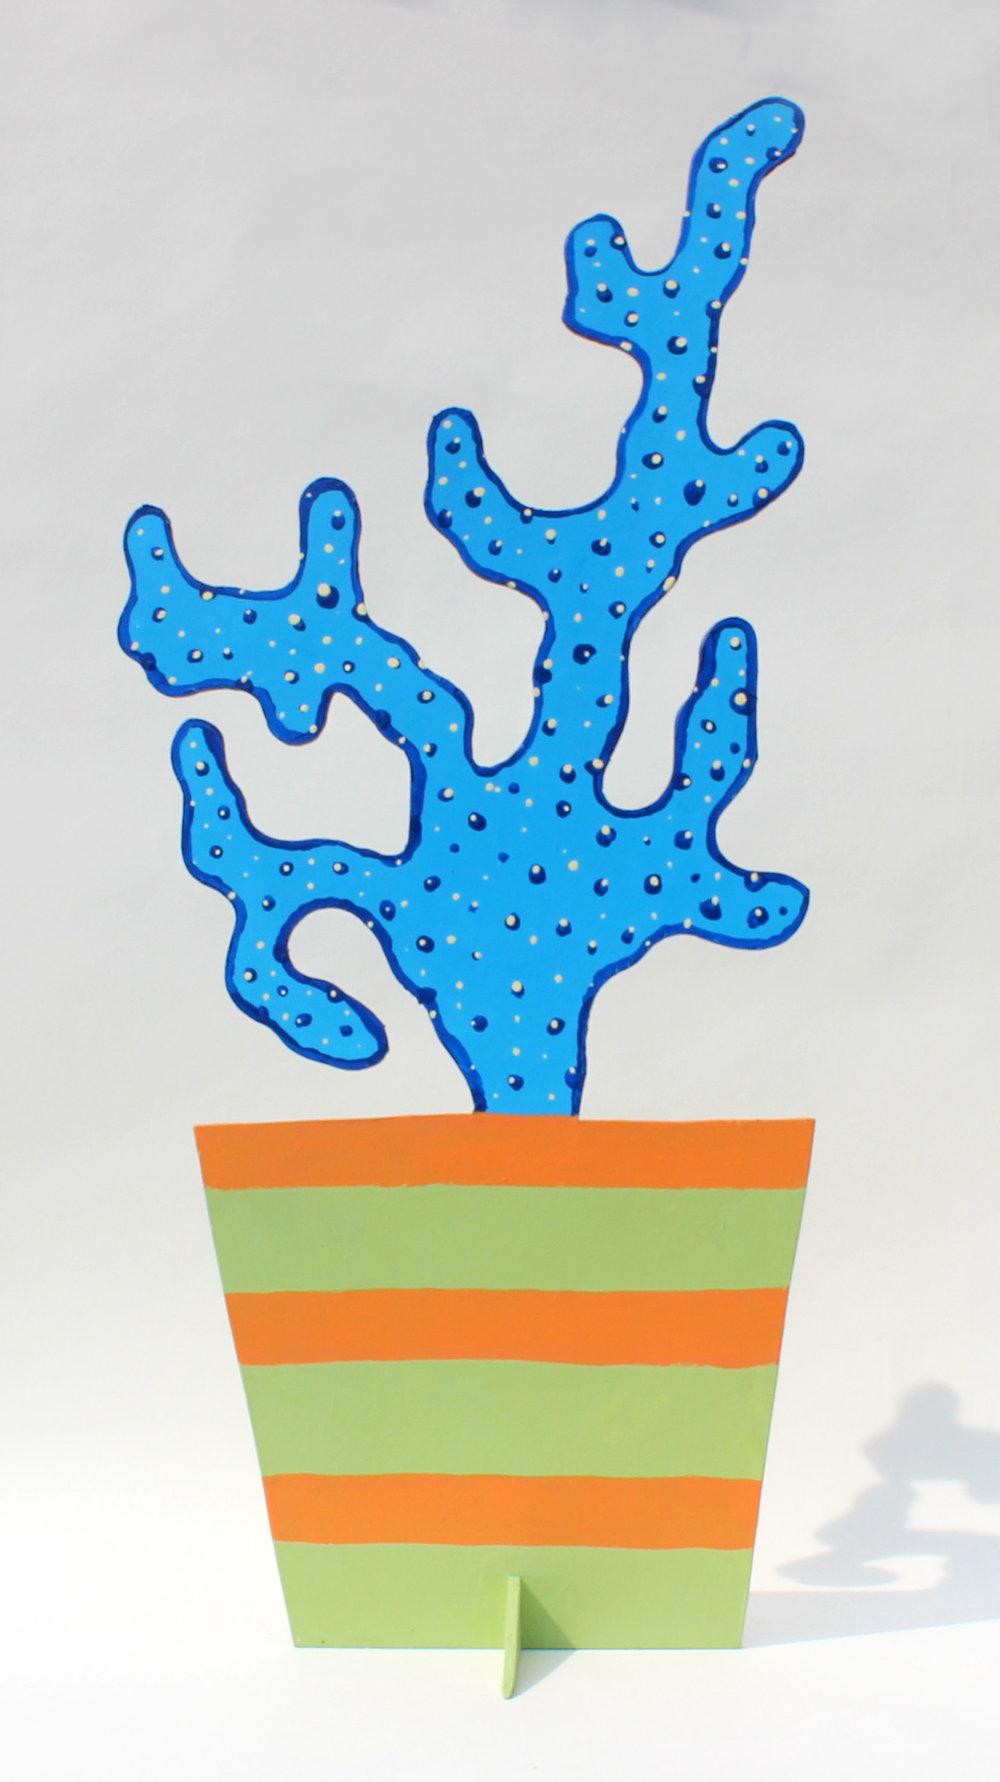 Sponge_Plant1_web_1571.jpg